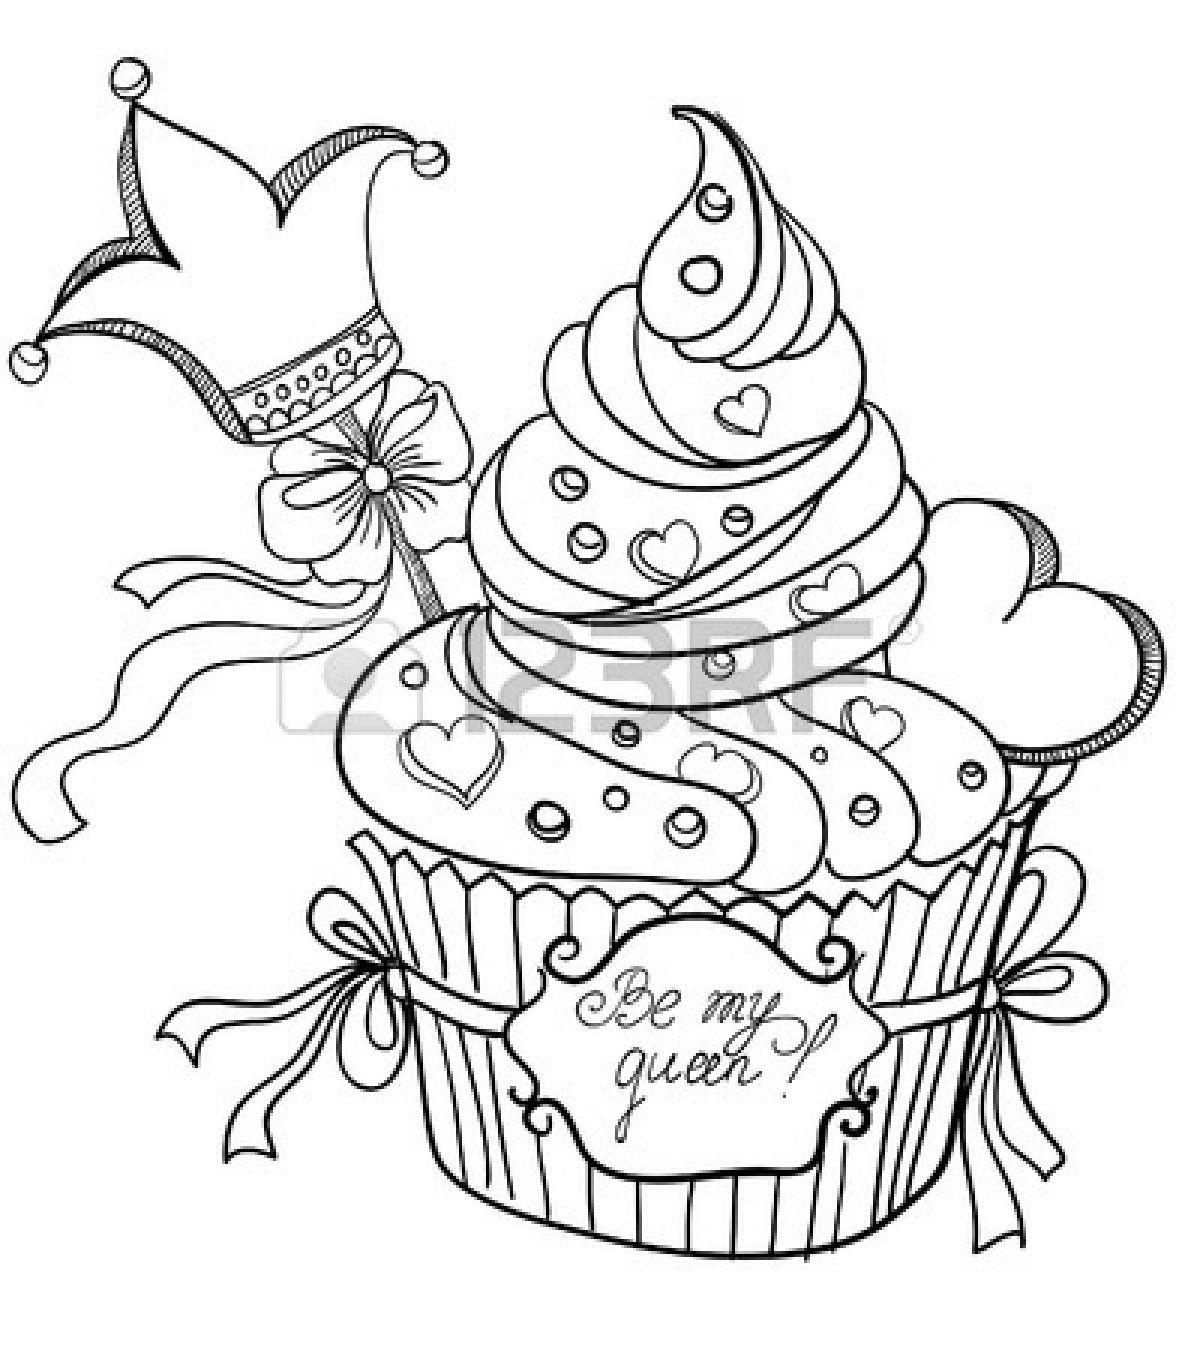 Pin de Katie Thompson en Cupcake Cuteness | Pinterest | Pintar ...